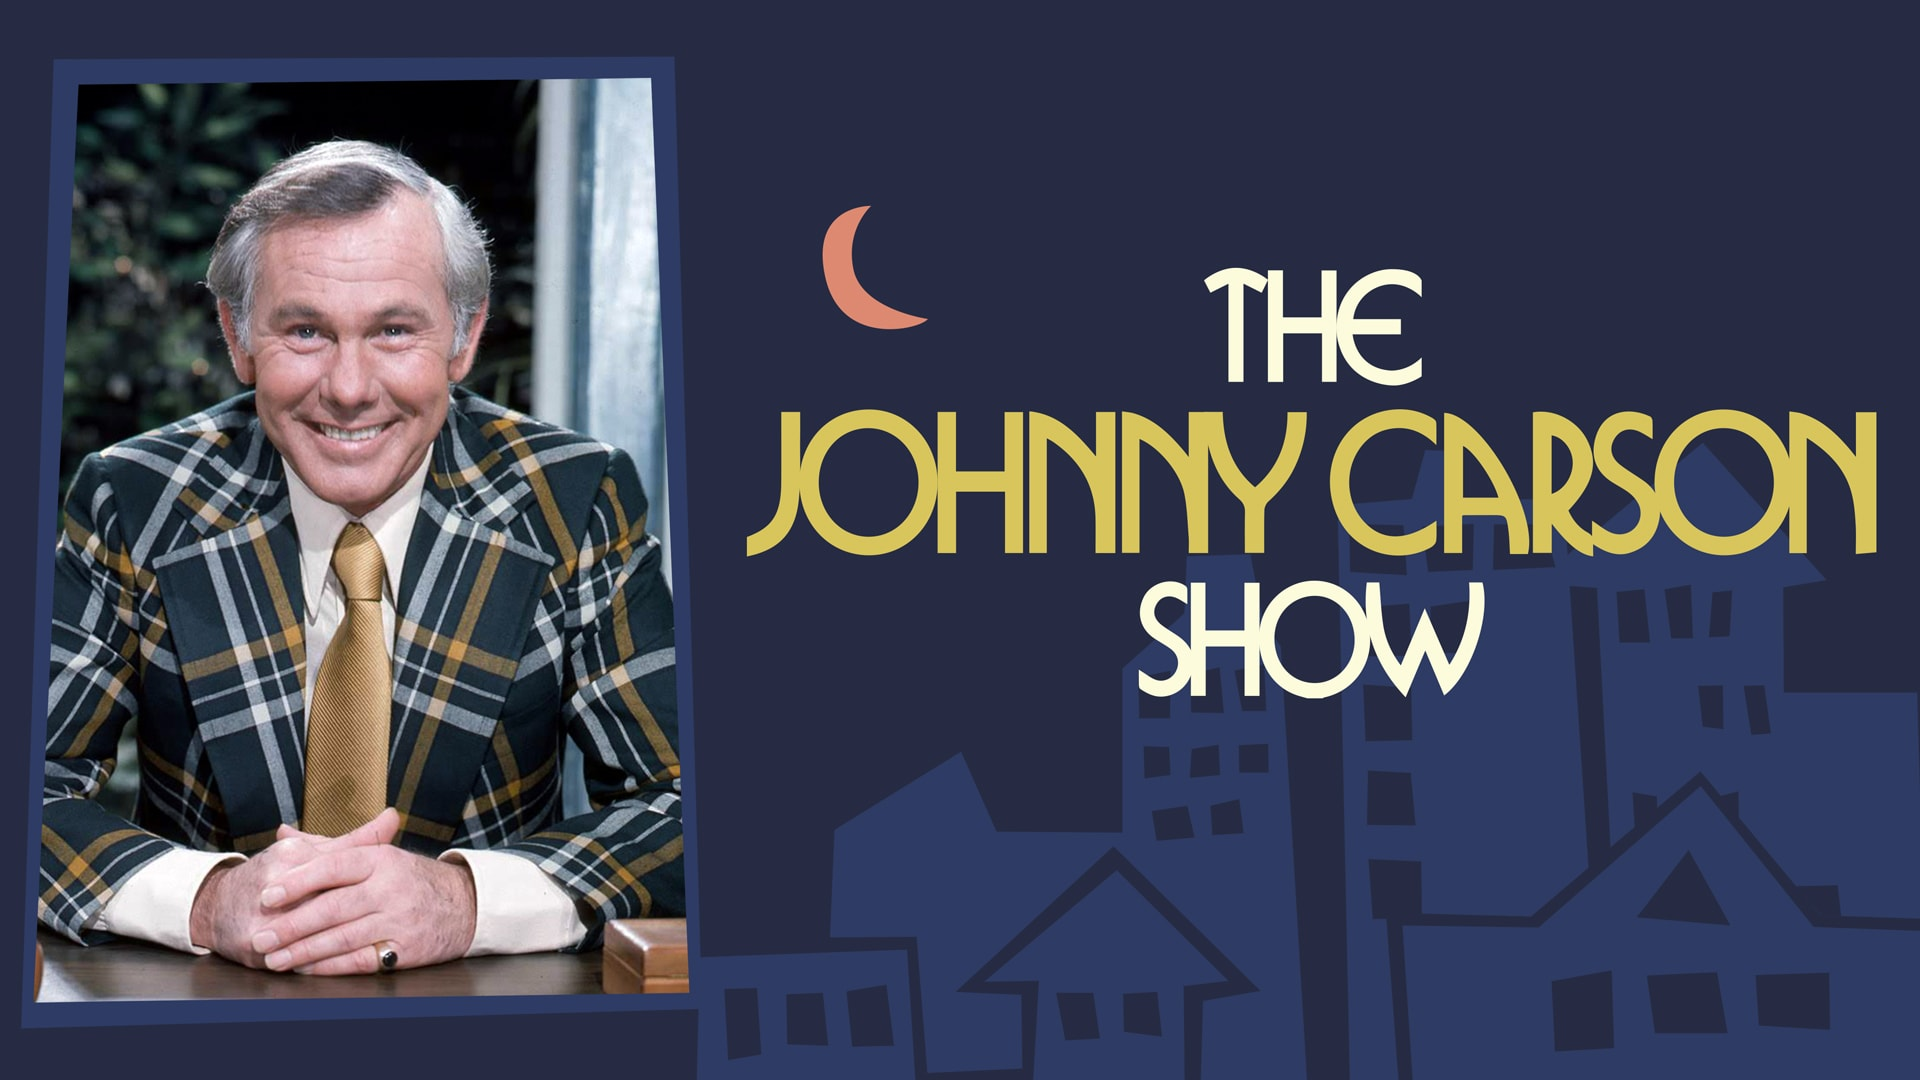 The Johnny Carson Show: Animal Antics With Joan Embery (6/13/84)